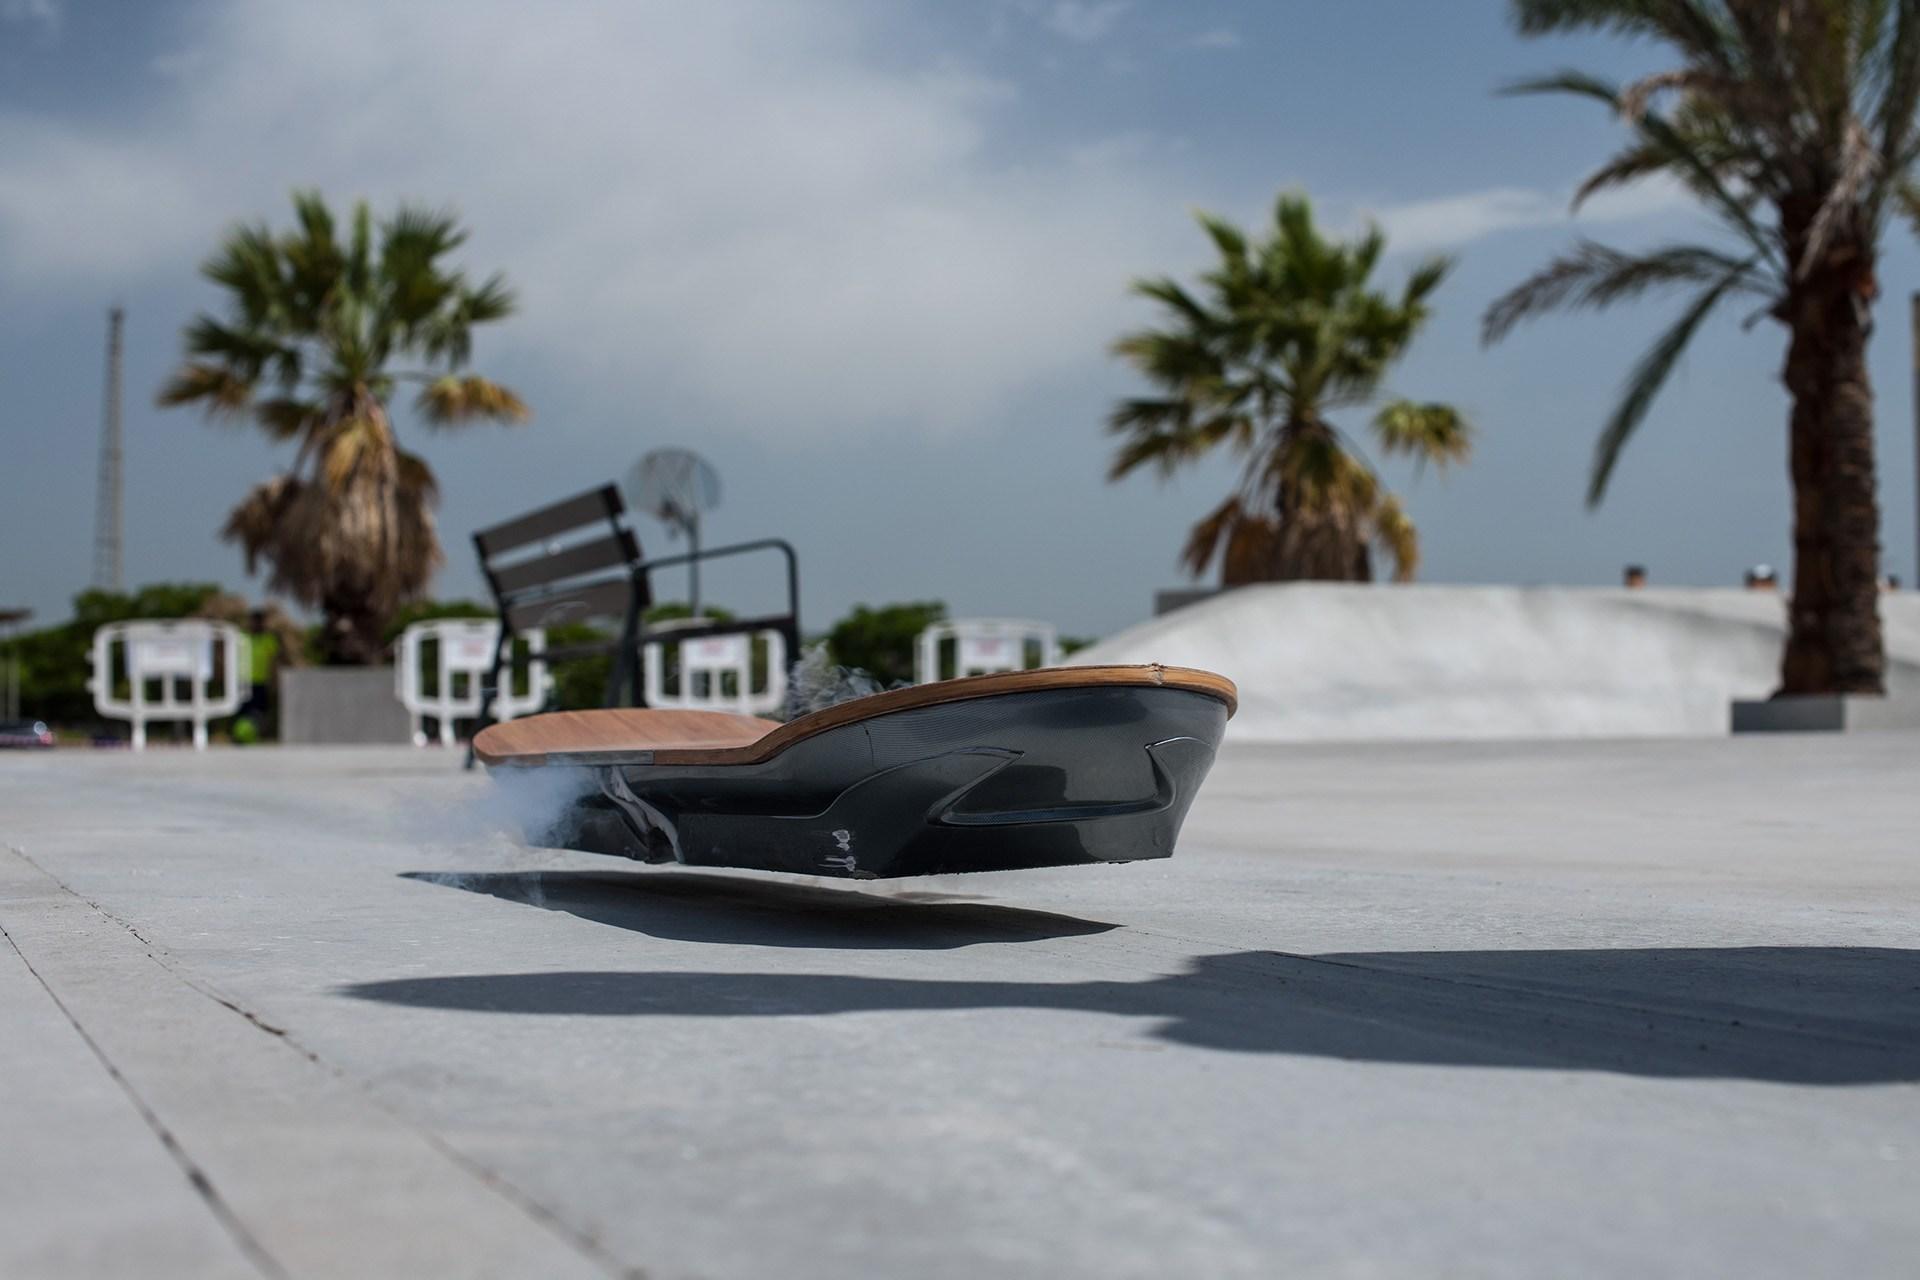 LexusHoverboard_002